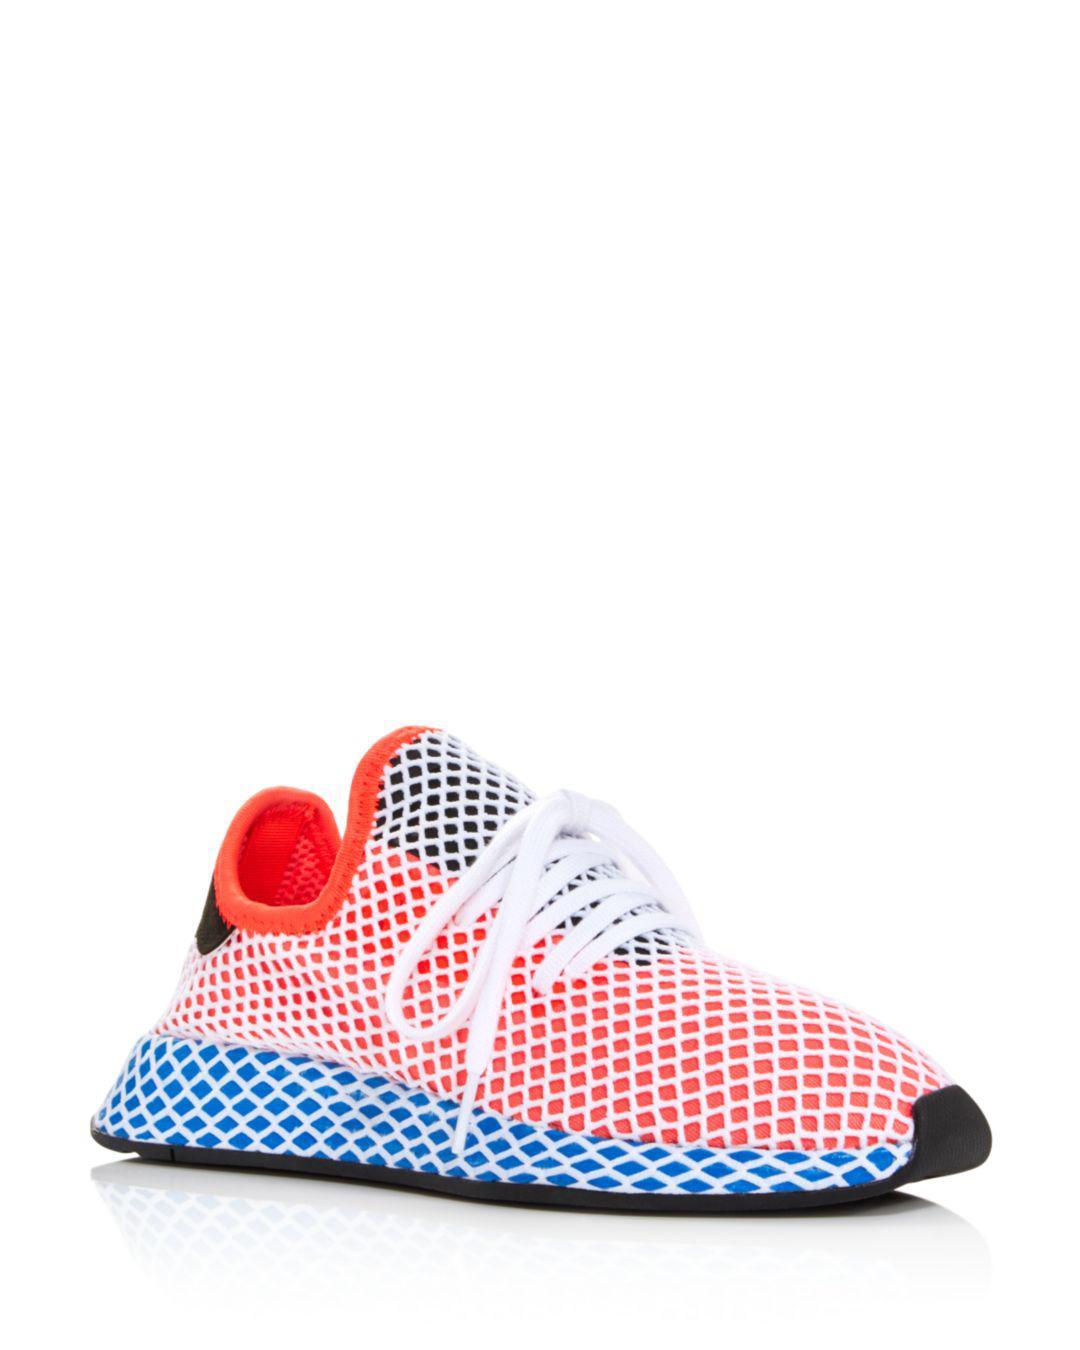 563ff6937b1e adidas trainers for womens net